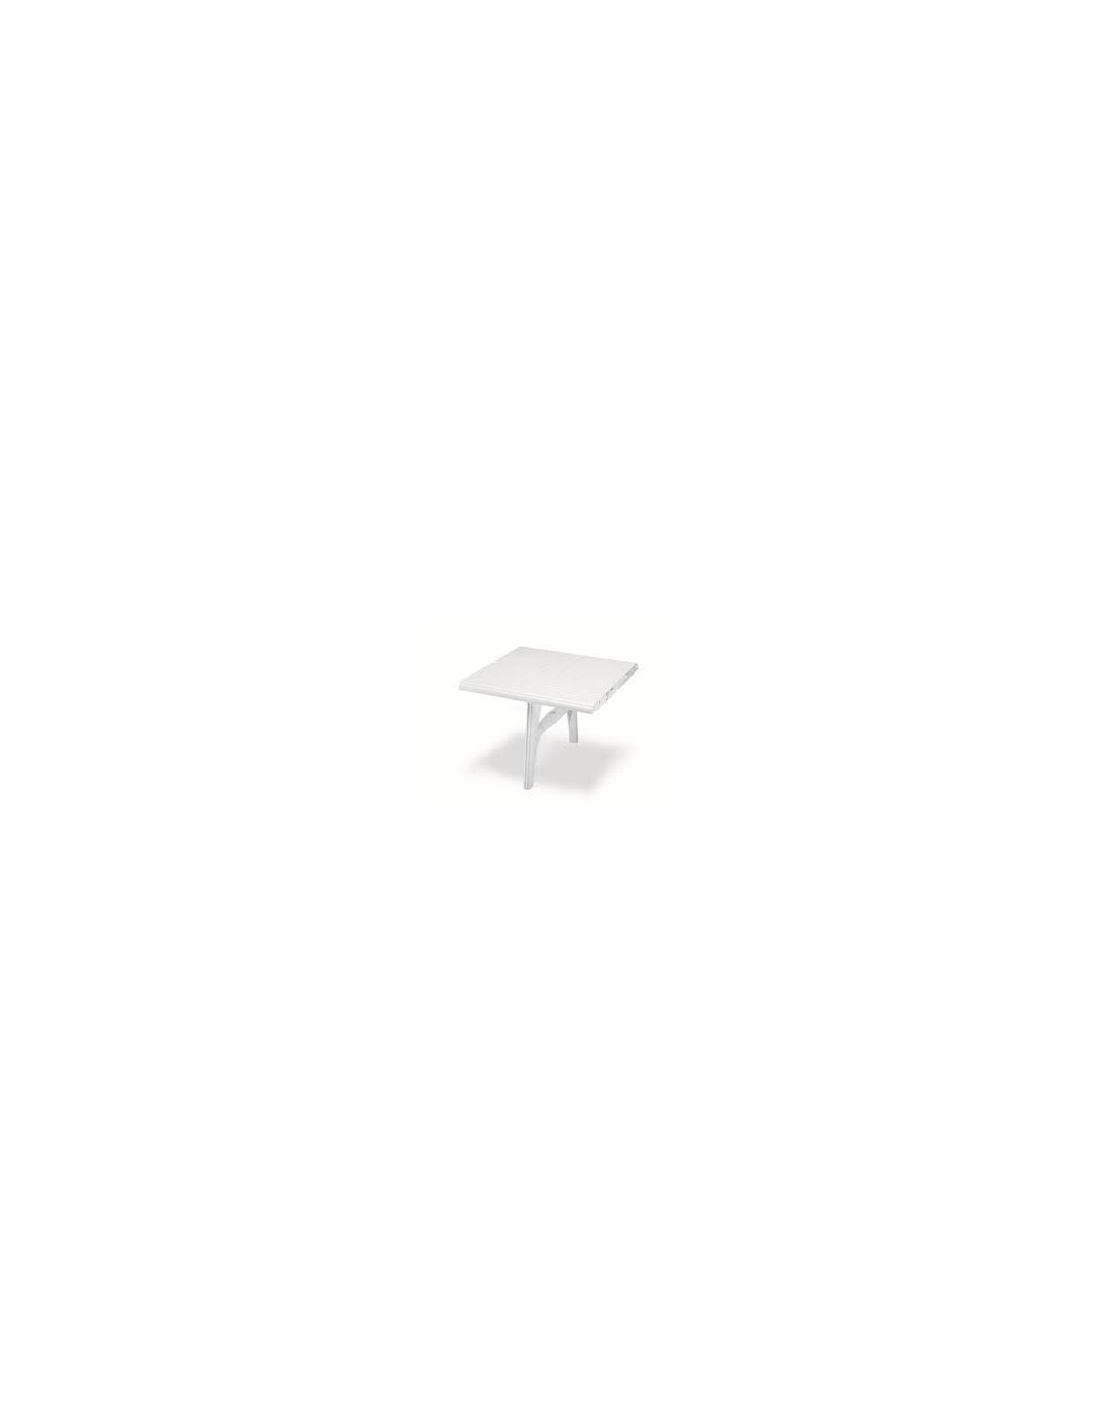 Tavoli Da Giardino Resina Scab.Prolunga Resina Da Esterno Tavolo Modello President 3000 Scab Design